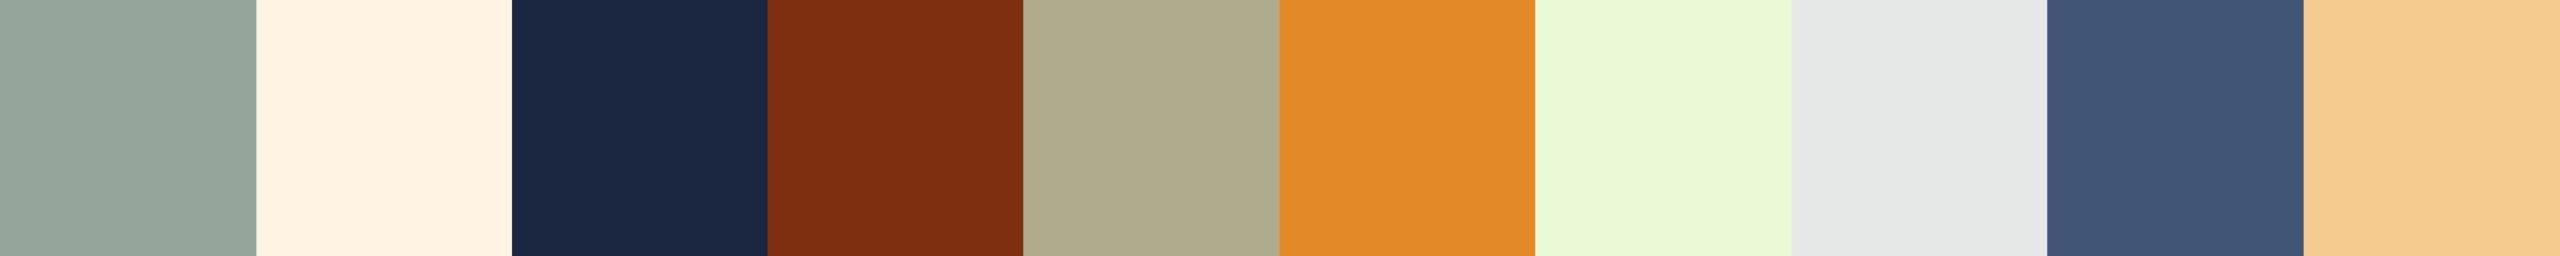 192 Fepolada Color Palette